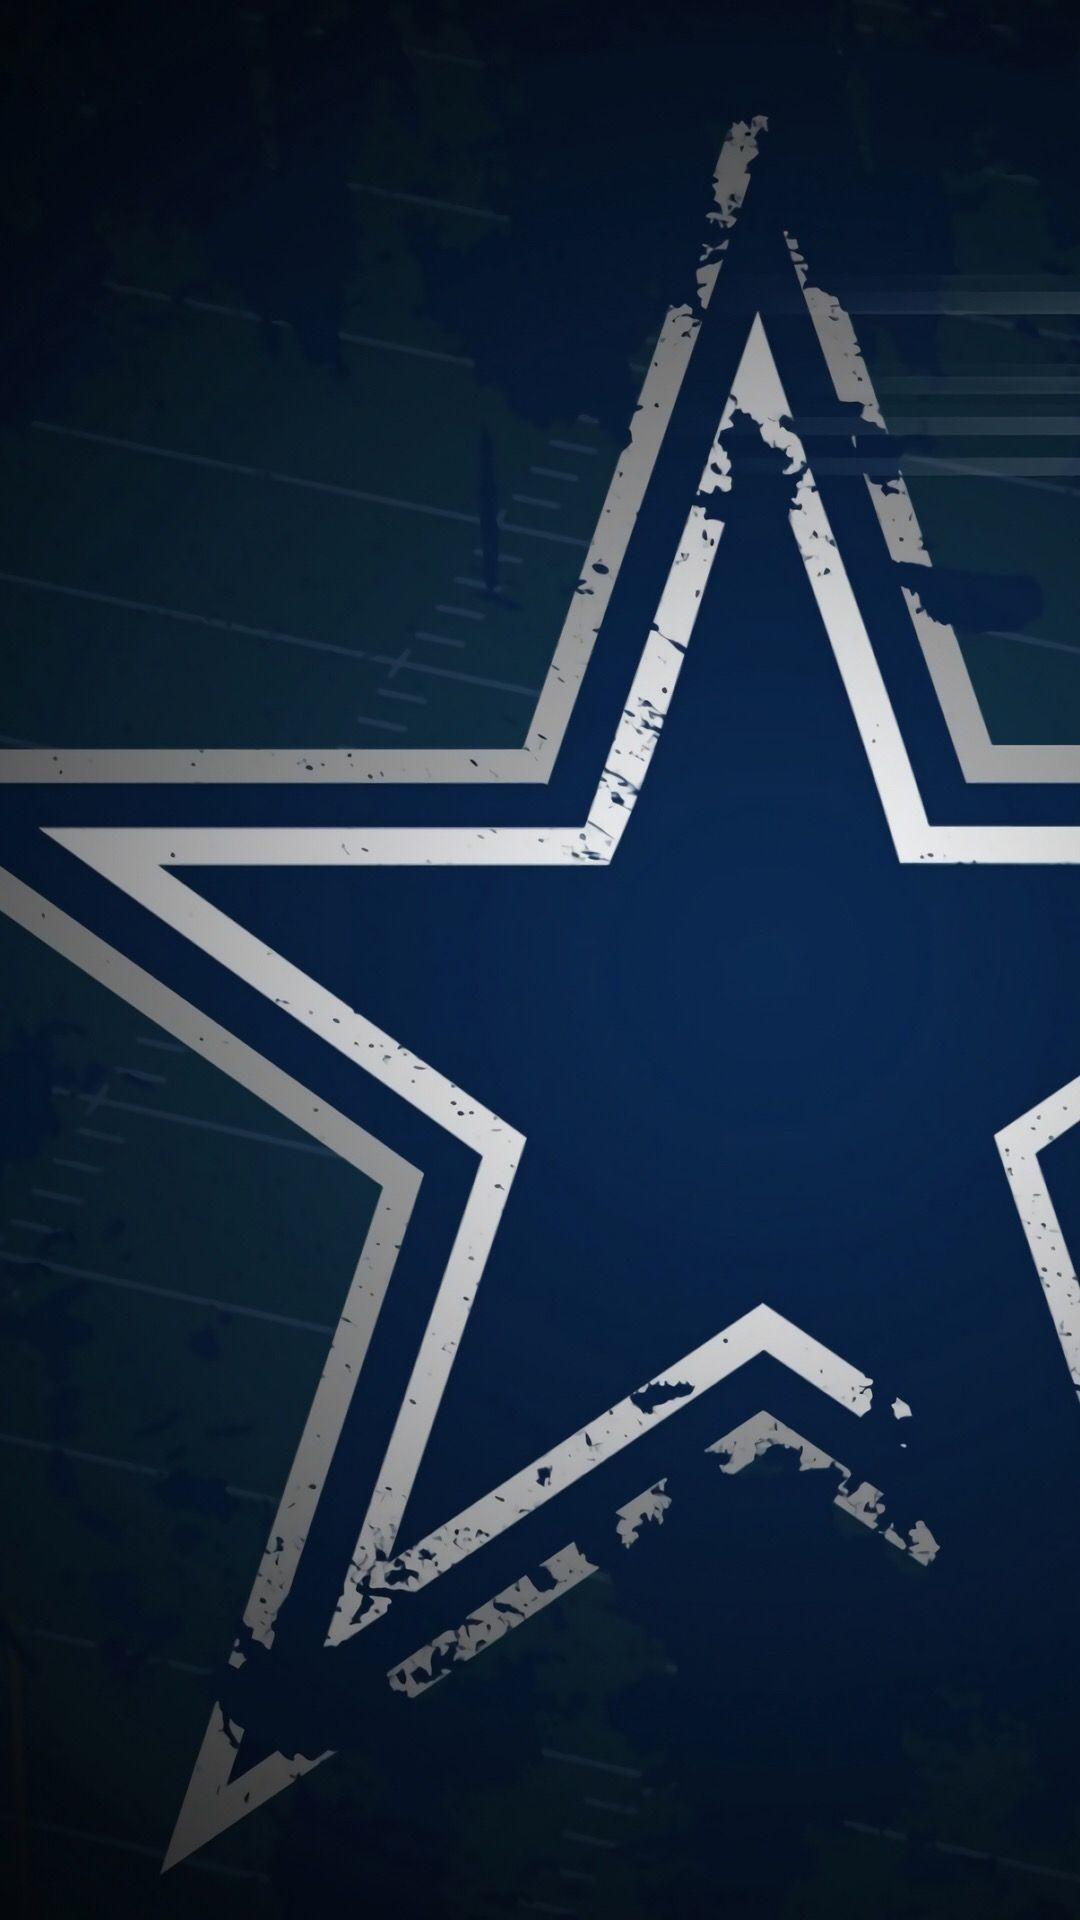 Dallas Cowboys Wallpaper 2018 iPhone